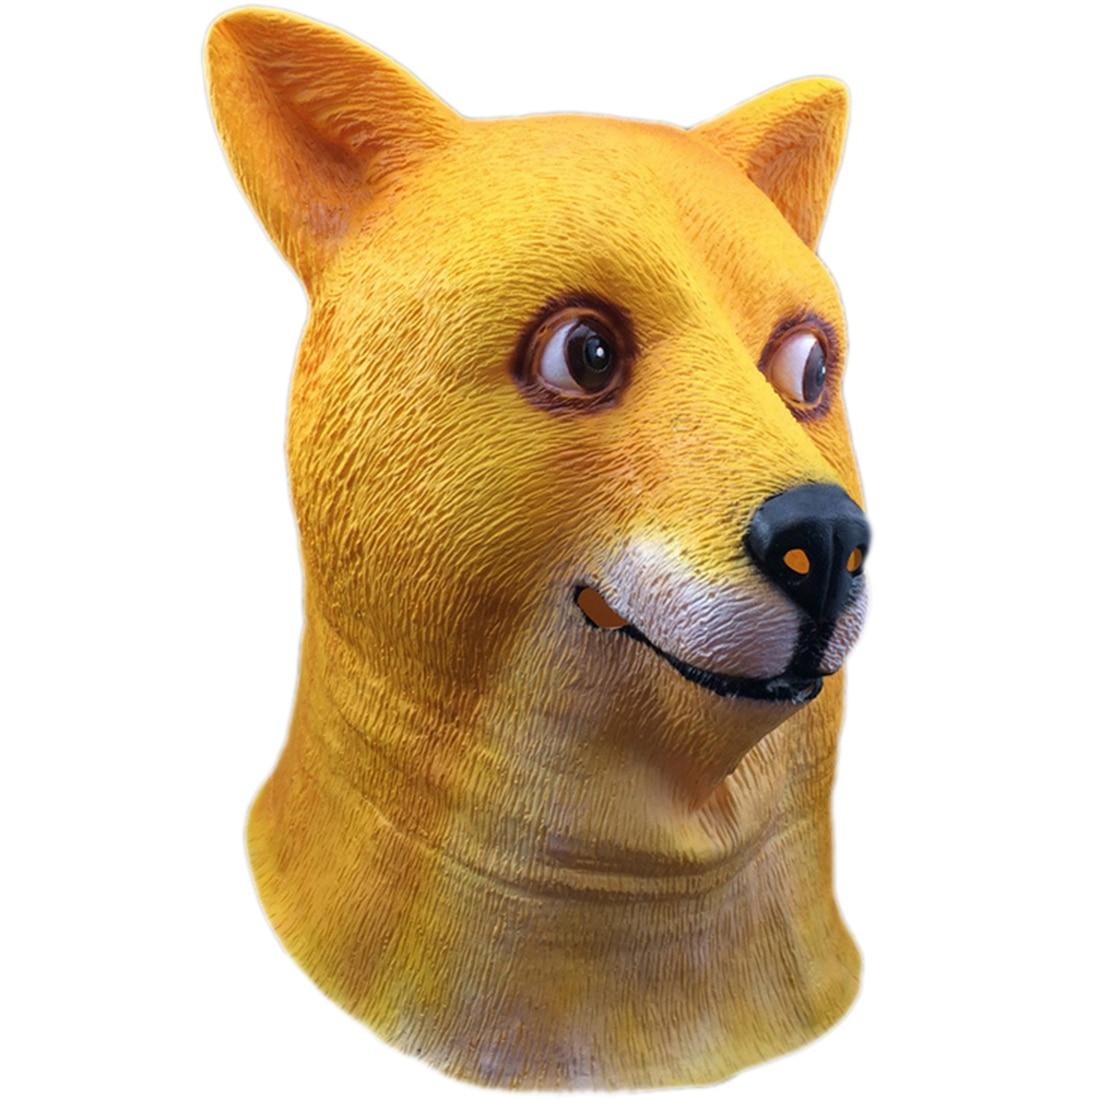 Dogen Full Face Maske Halloween Cosplay Verrückte Maske Masquerade Dress Up Hund Gesicht Maske Karneval Party Favor Supplies Accesoires 2018